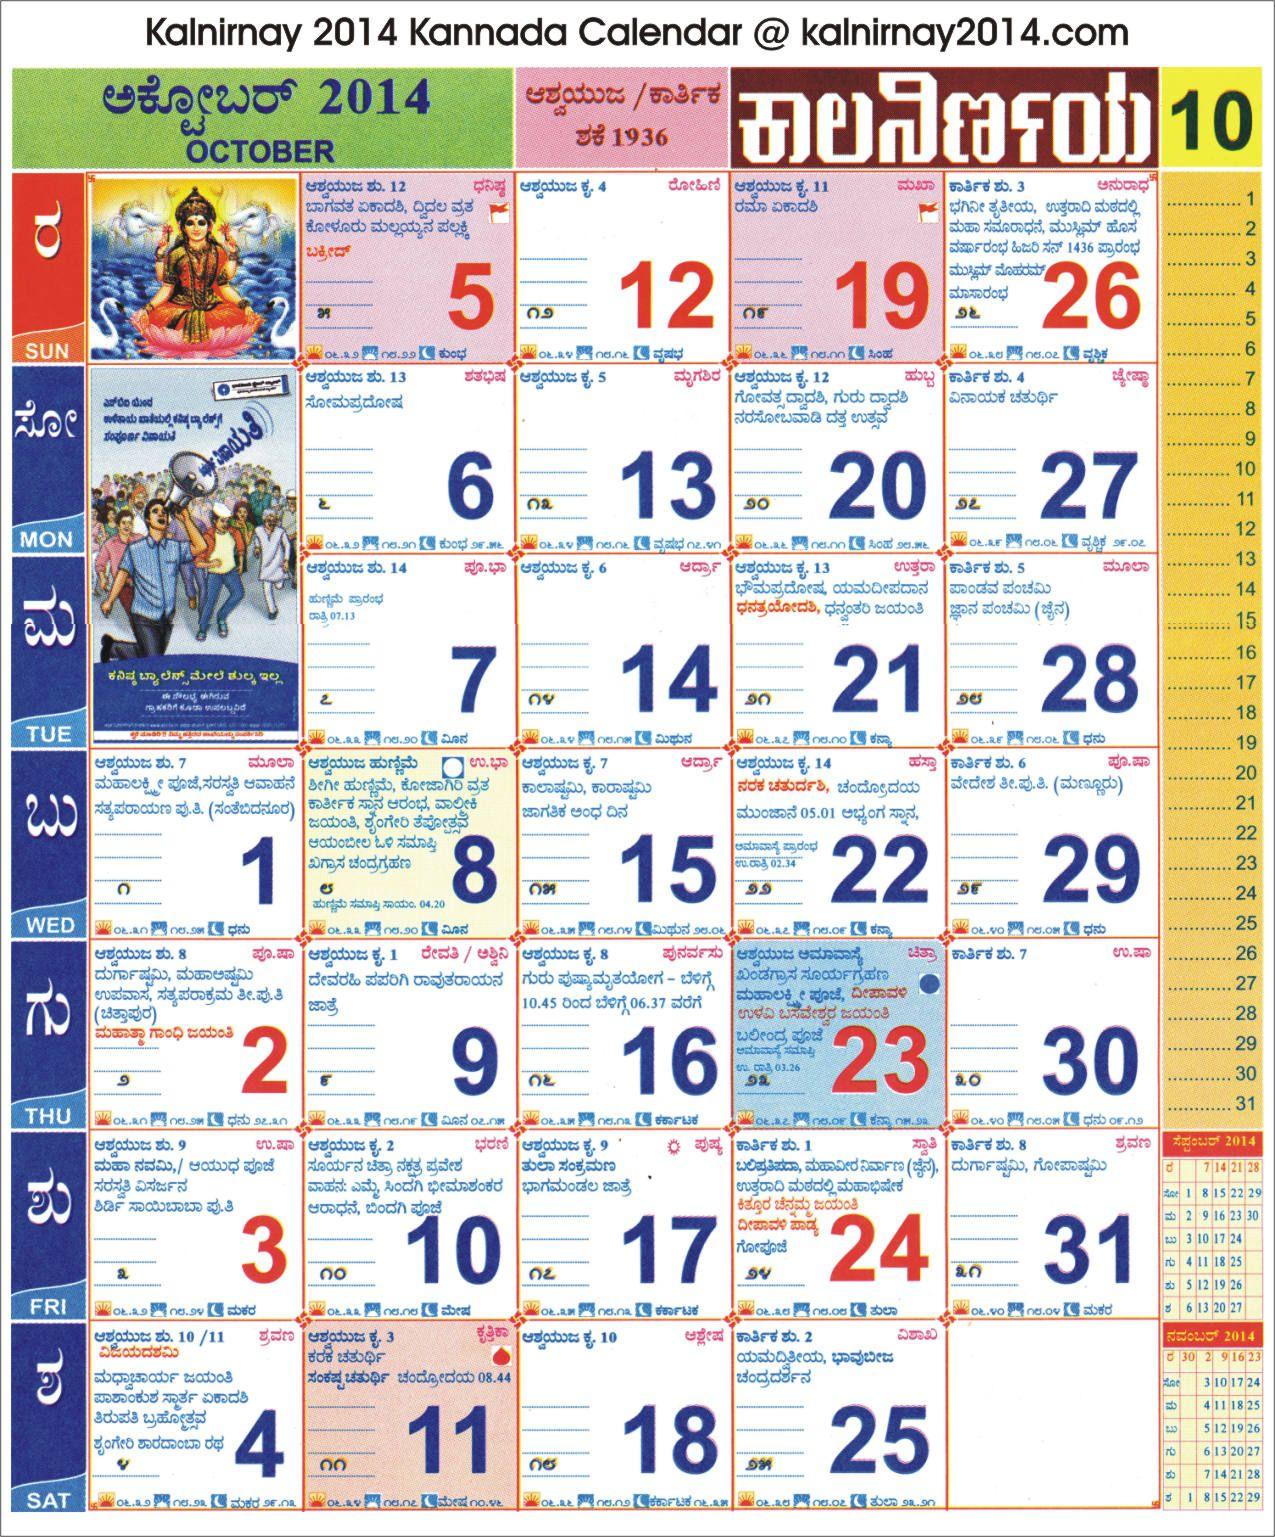 October 2014 Kannada Kalnirnay Calendar | Calendar, Website regarding Kannada Calendar 2020 July